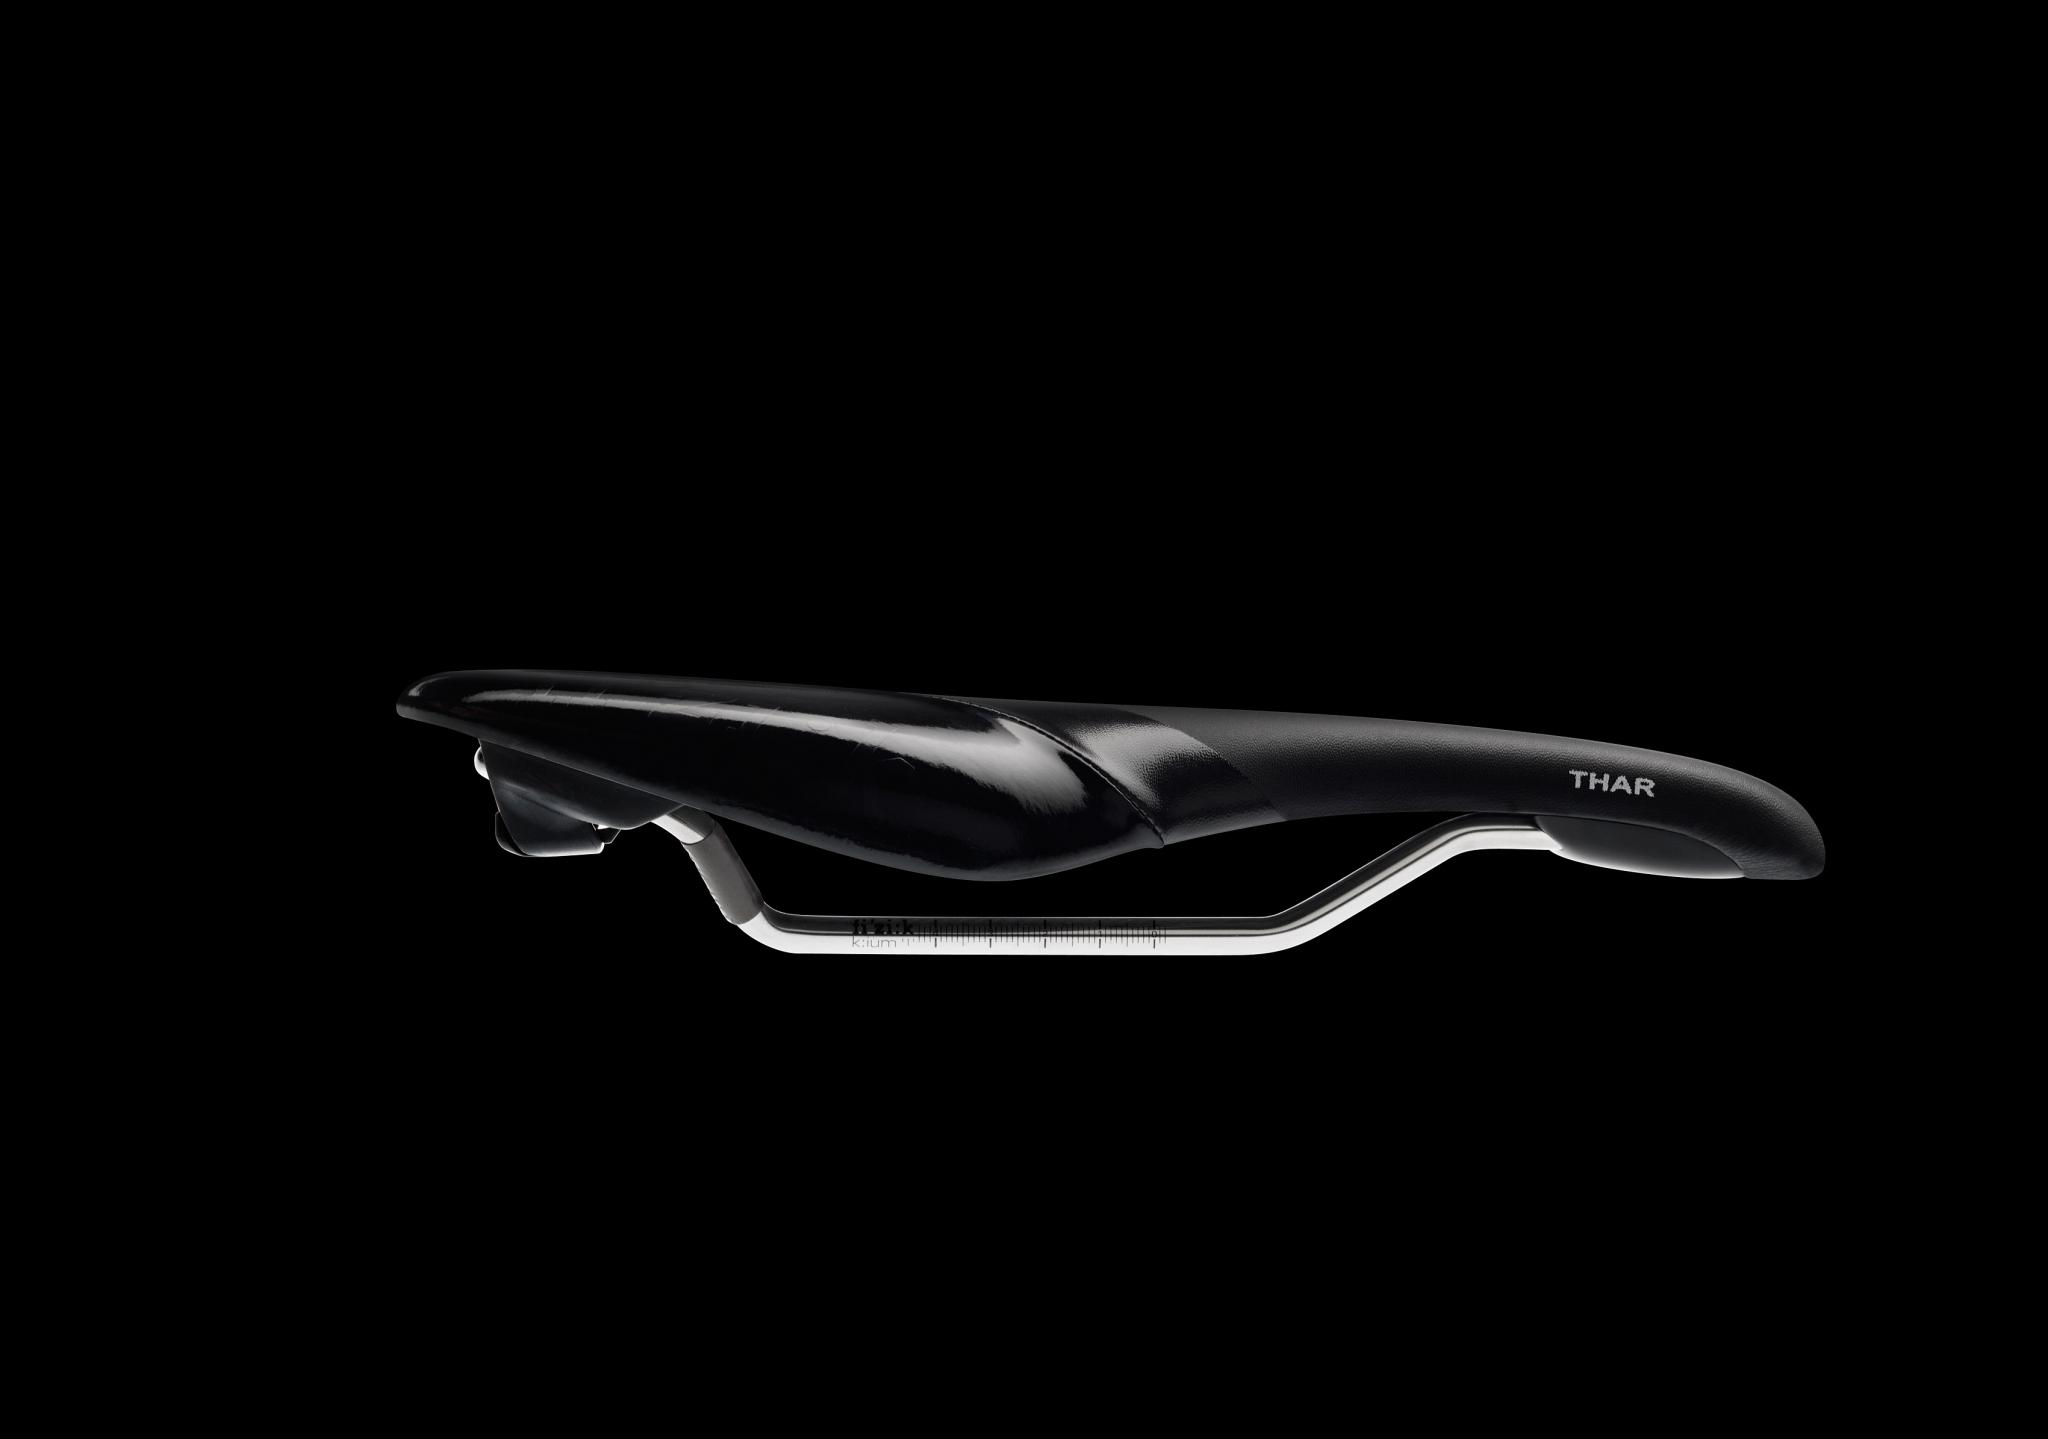 Thar-kium-black-black-front-b-7059